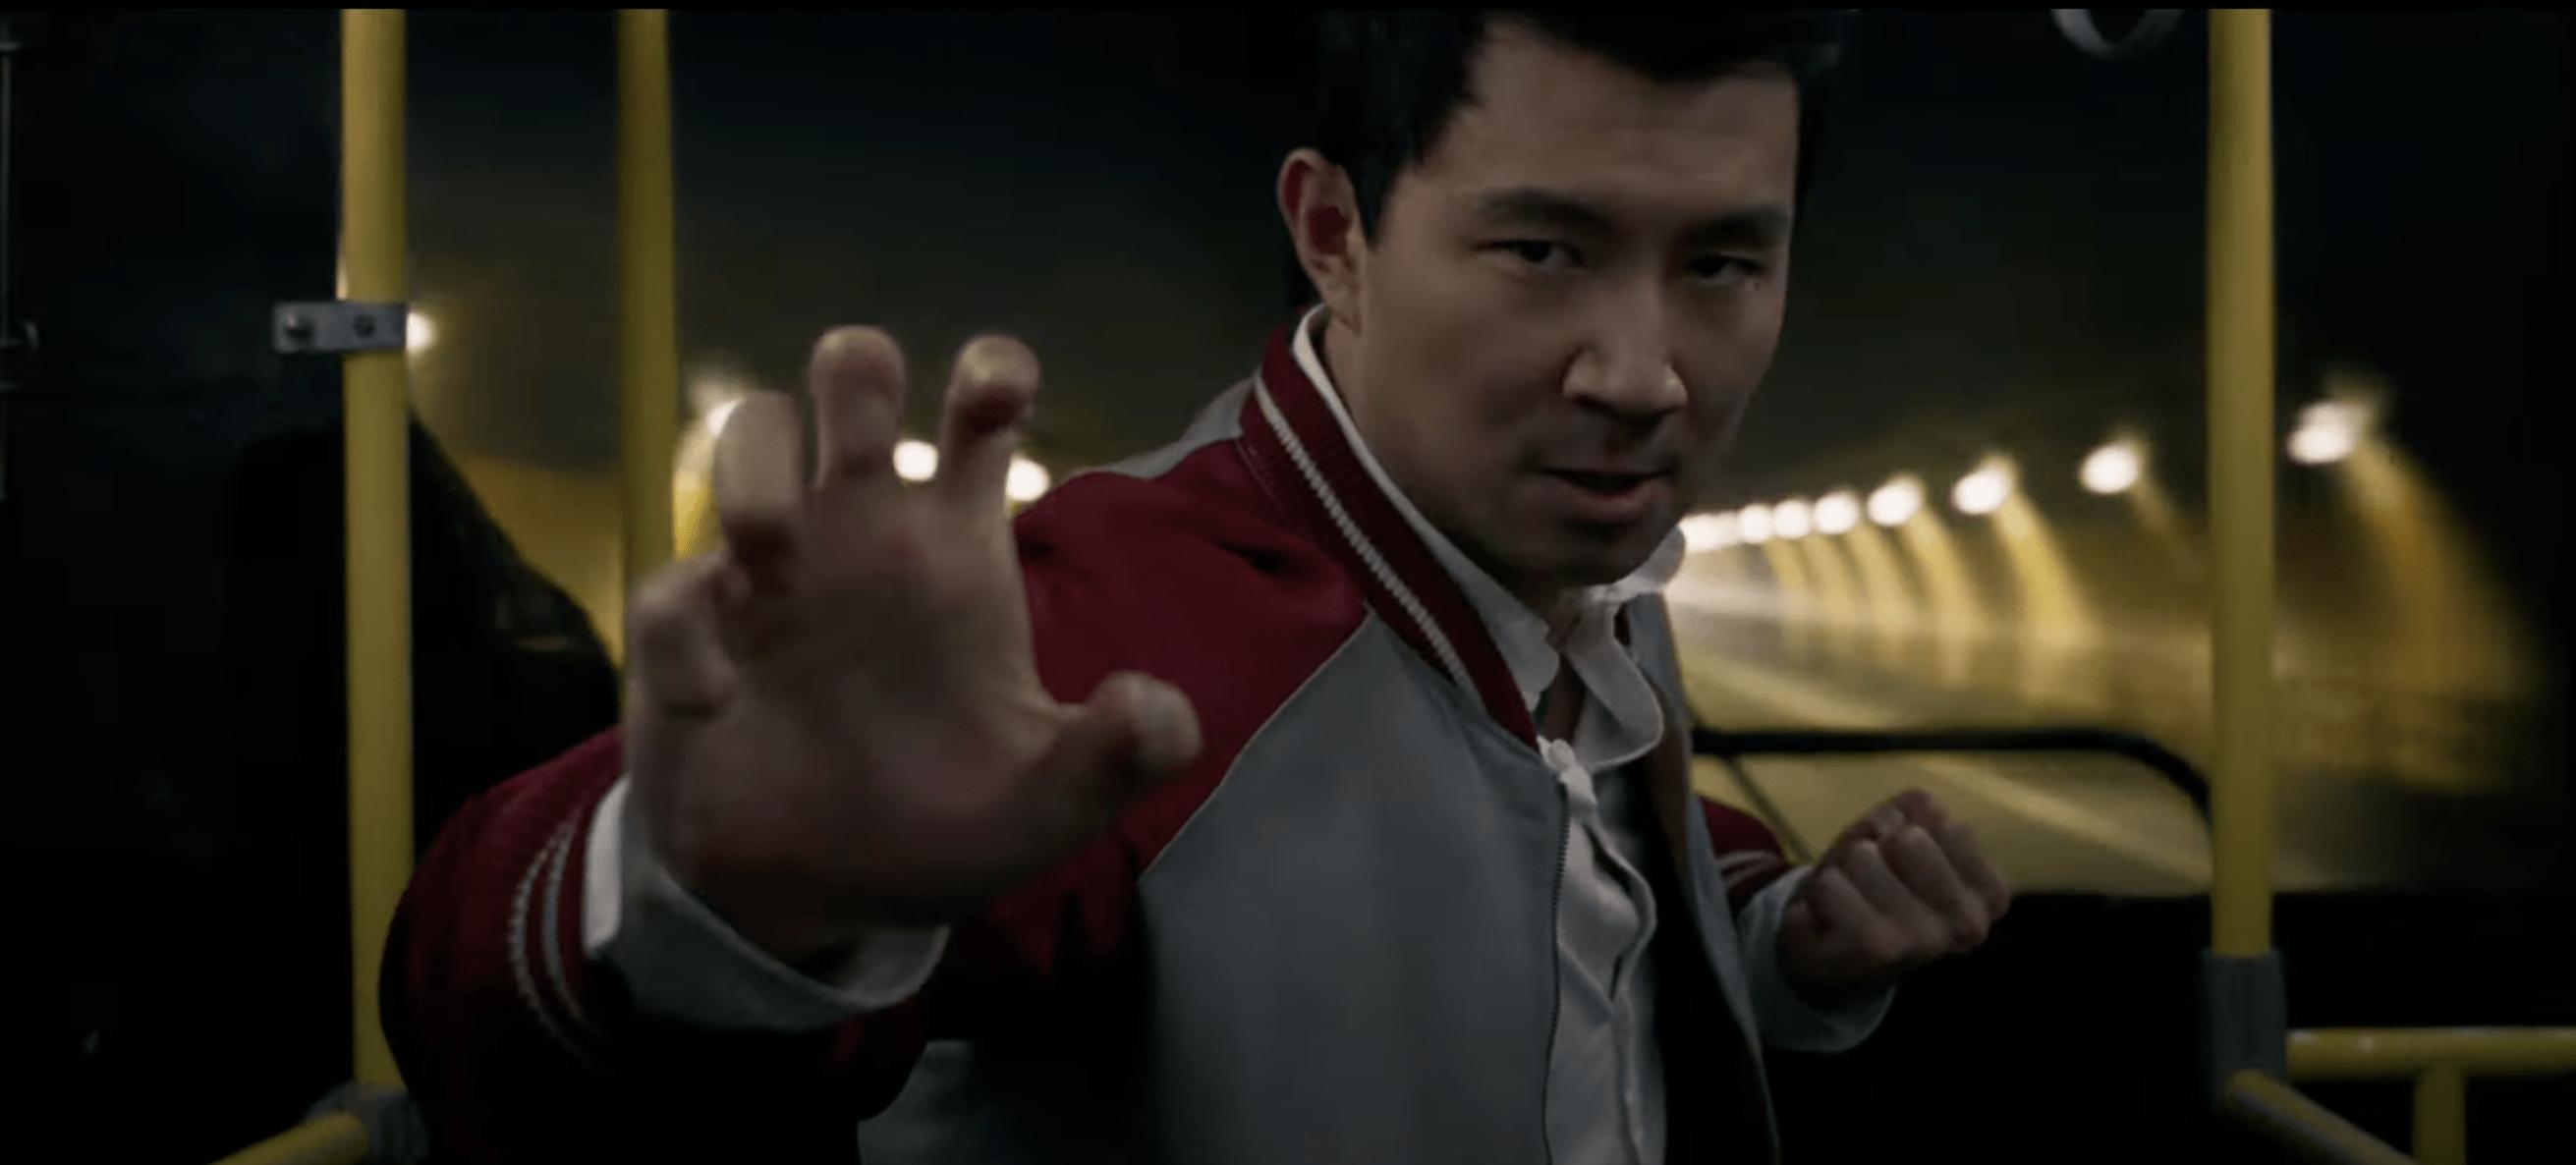 Shang-chi trailer breakdown